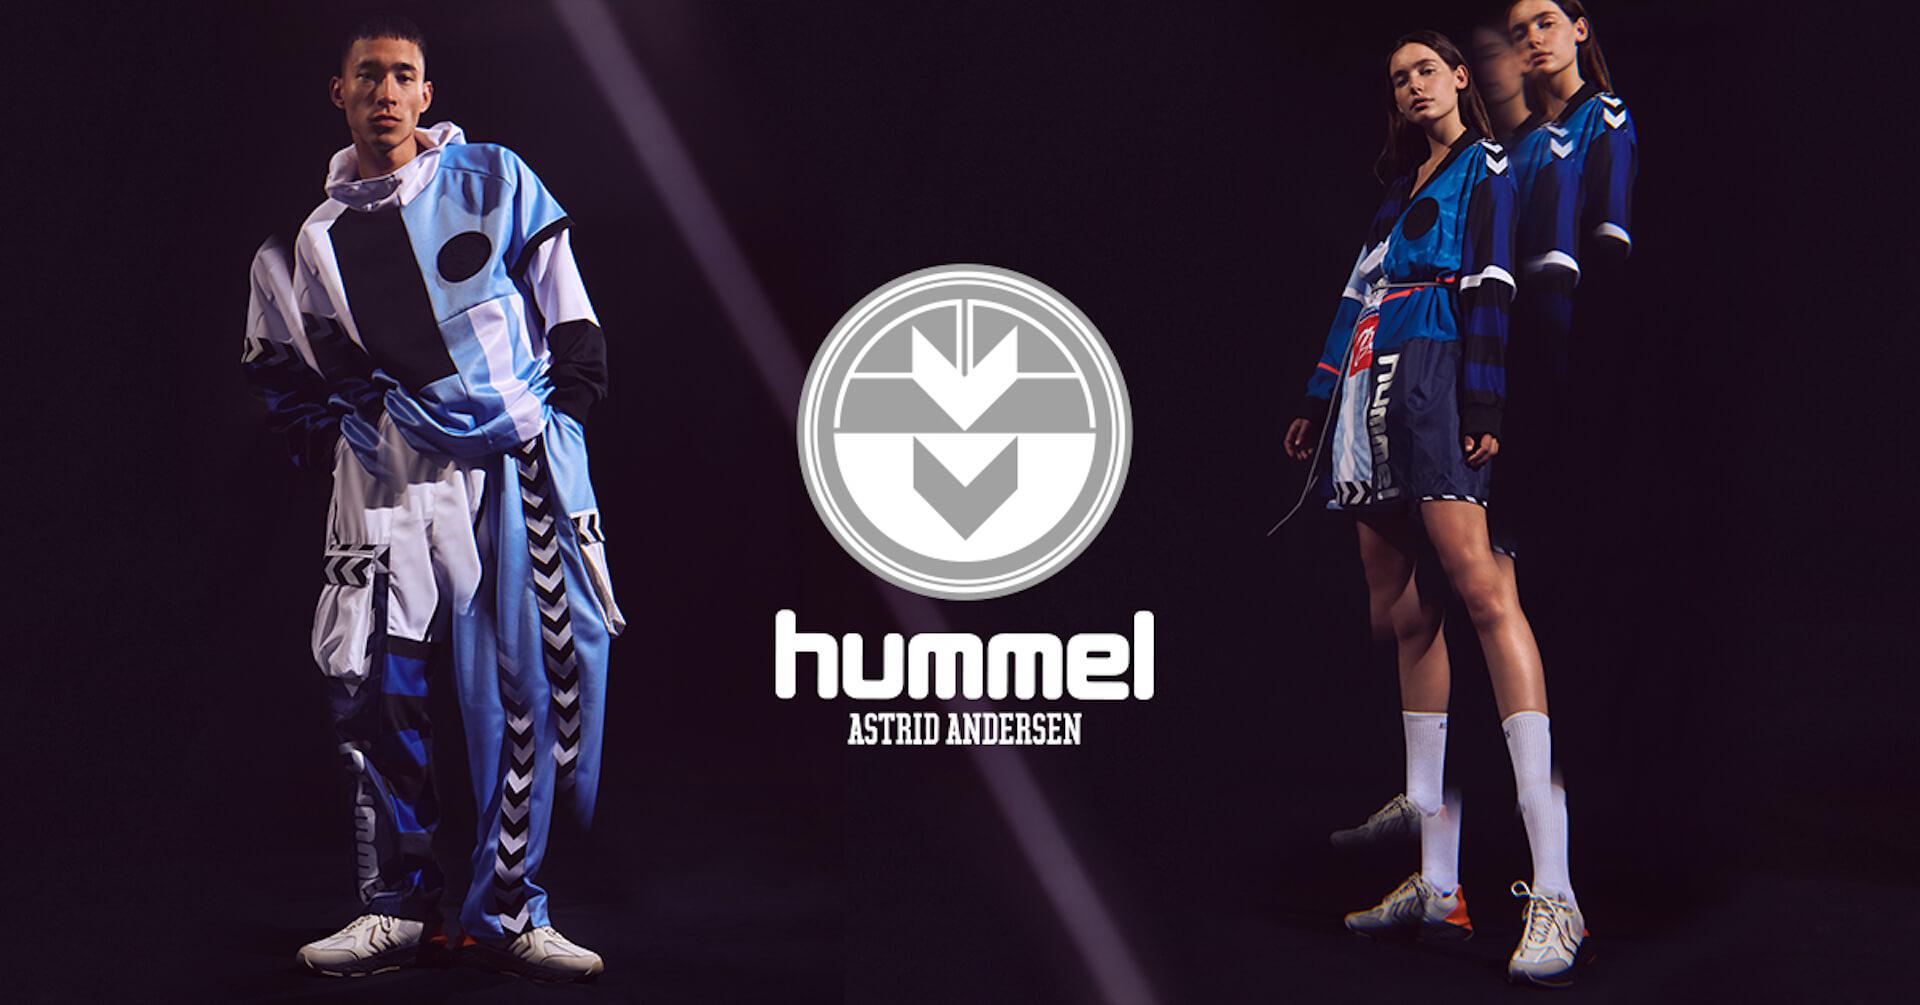 HUMMEL HIVEとASTRID ANDERSENのコラボスニーカーが東京・上野のmita sneakers限定で発売! lf200819_hummelhive_astritandersen_11